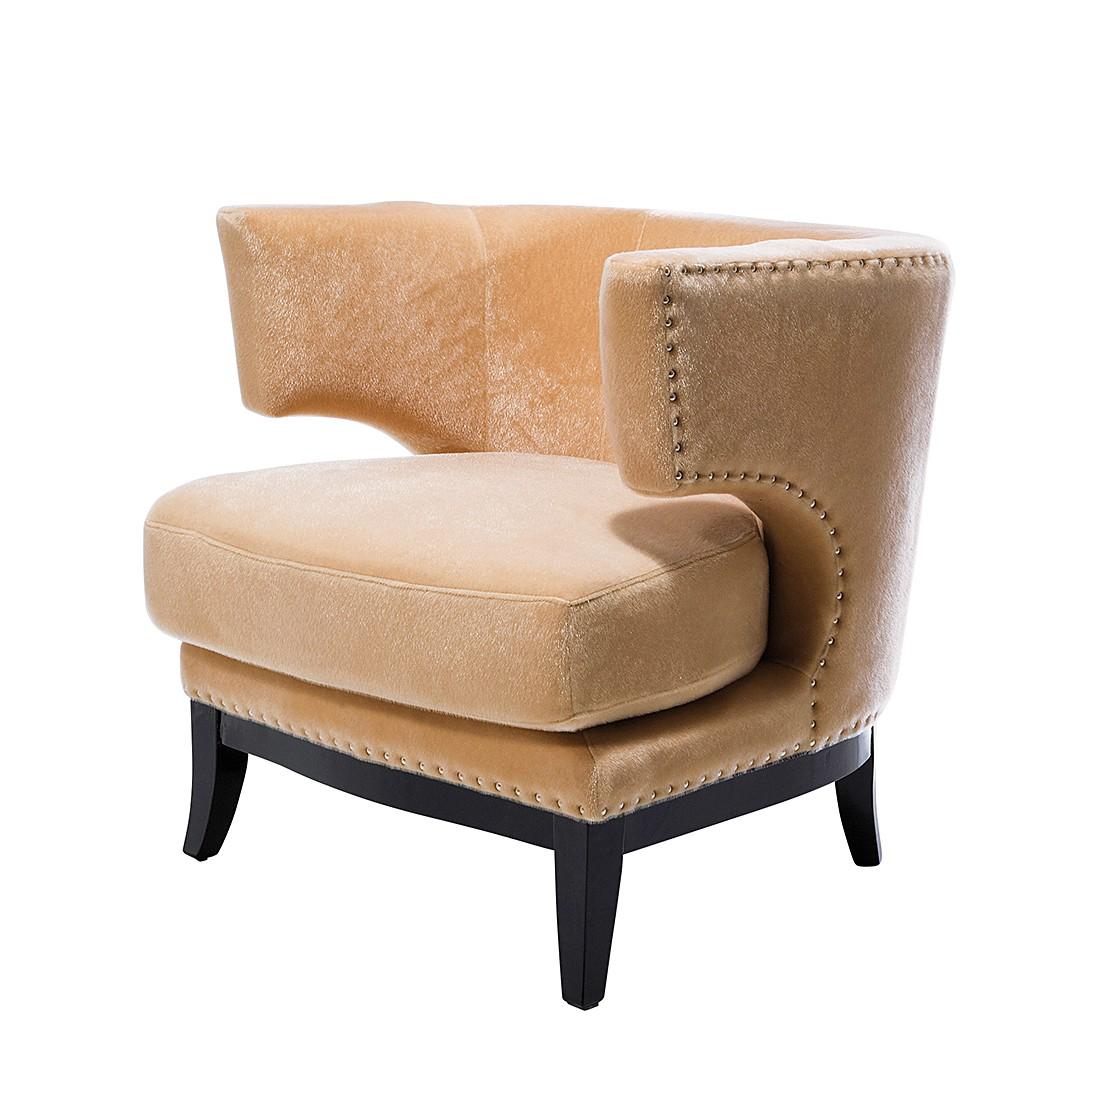 Fauteuil Art Deco - Velours beige, Kare Design